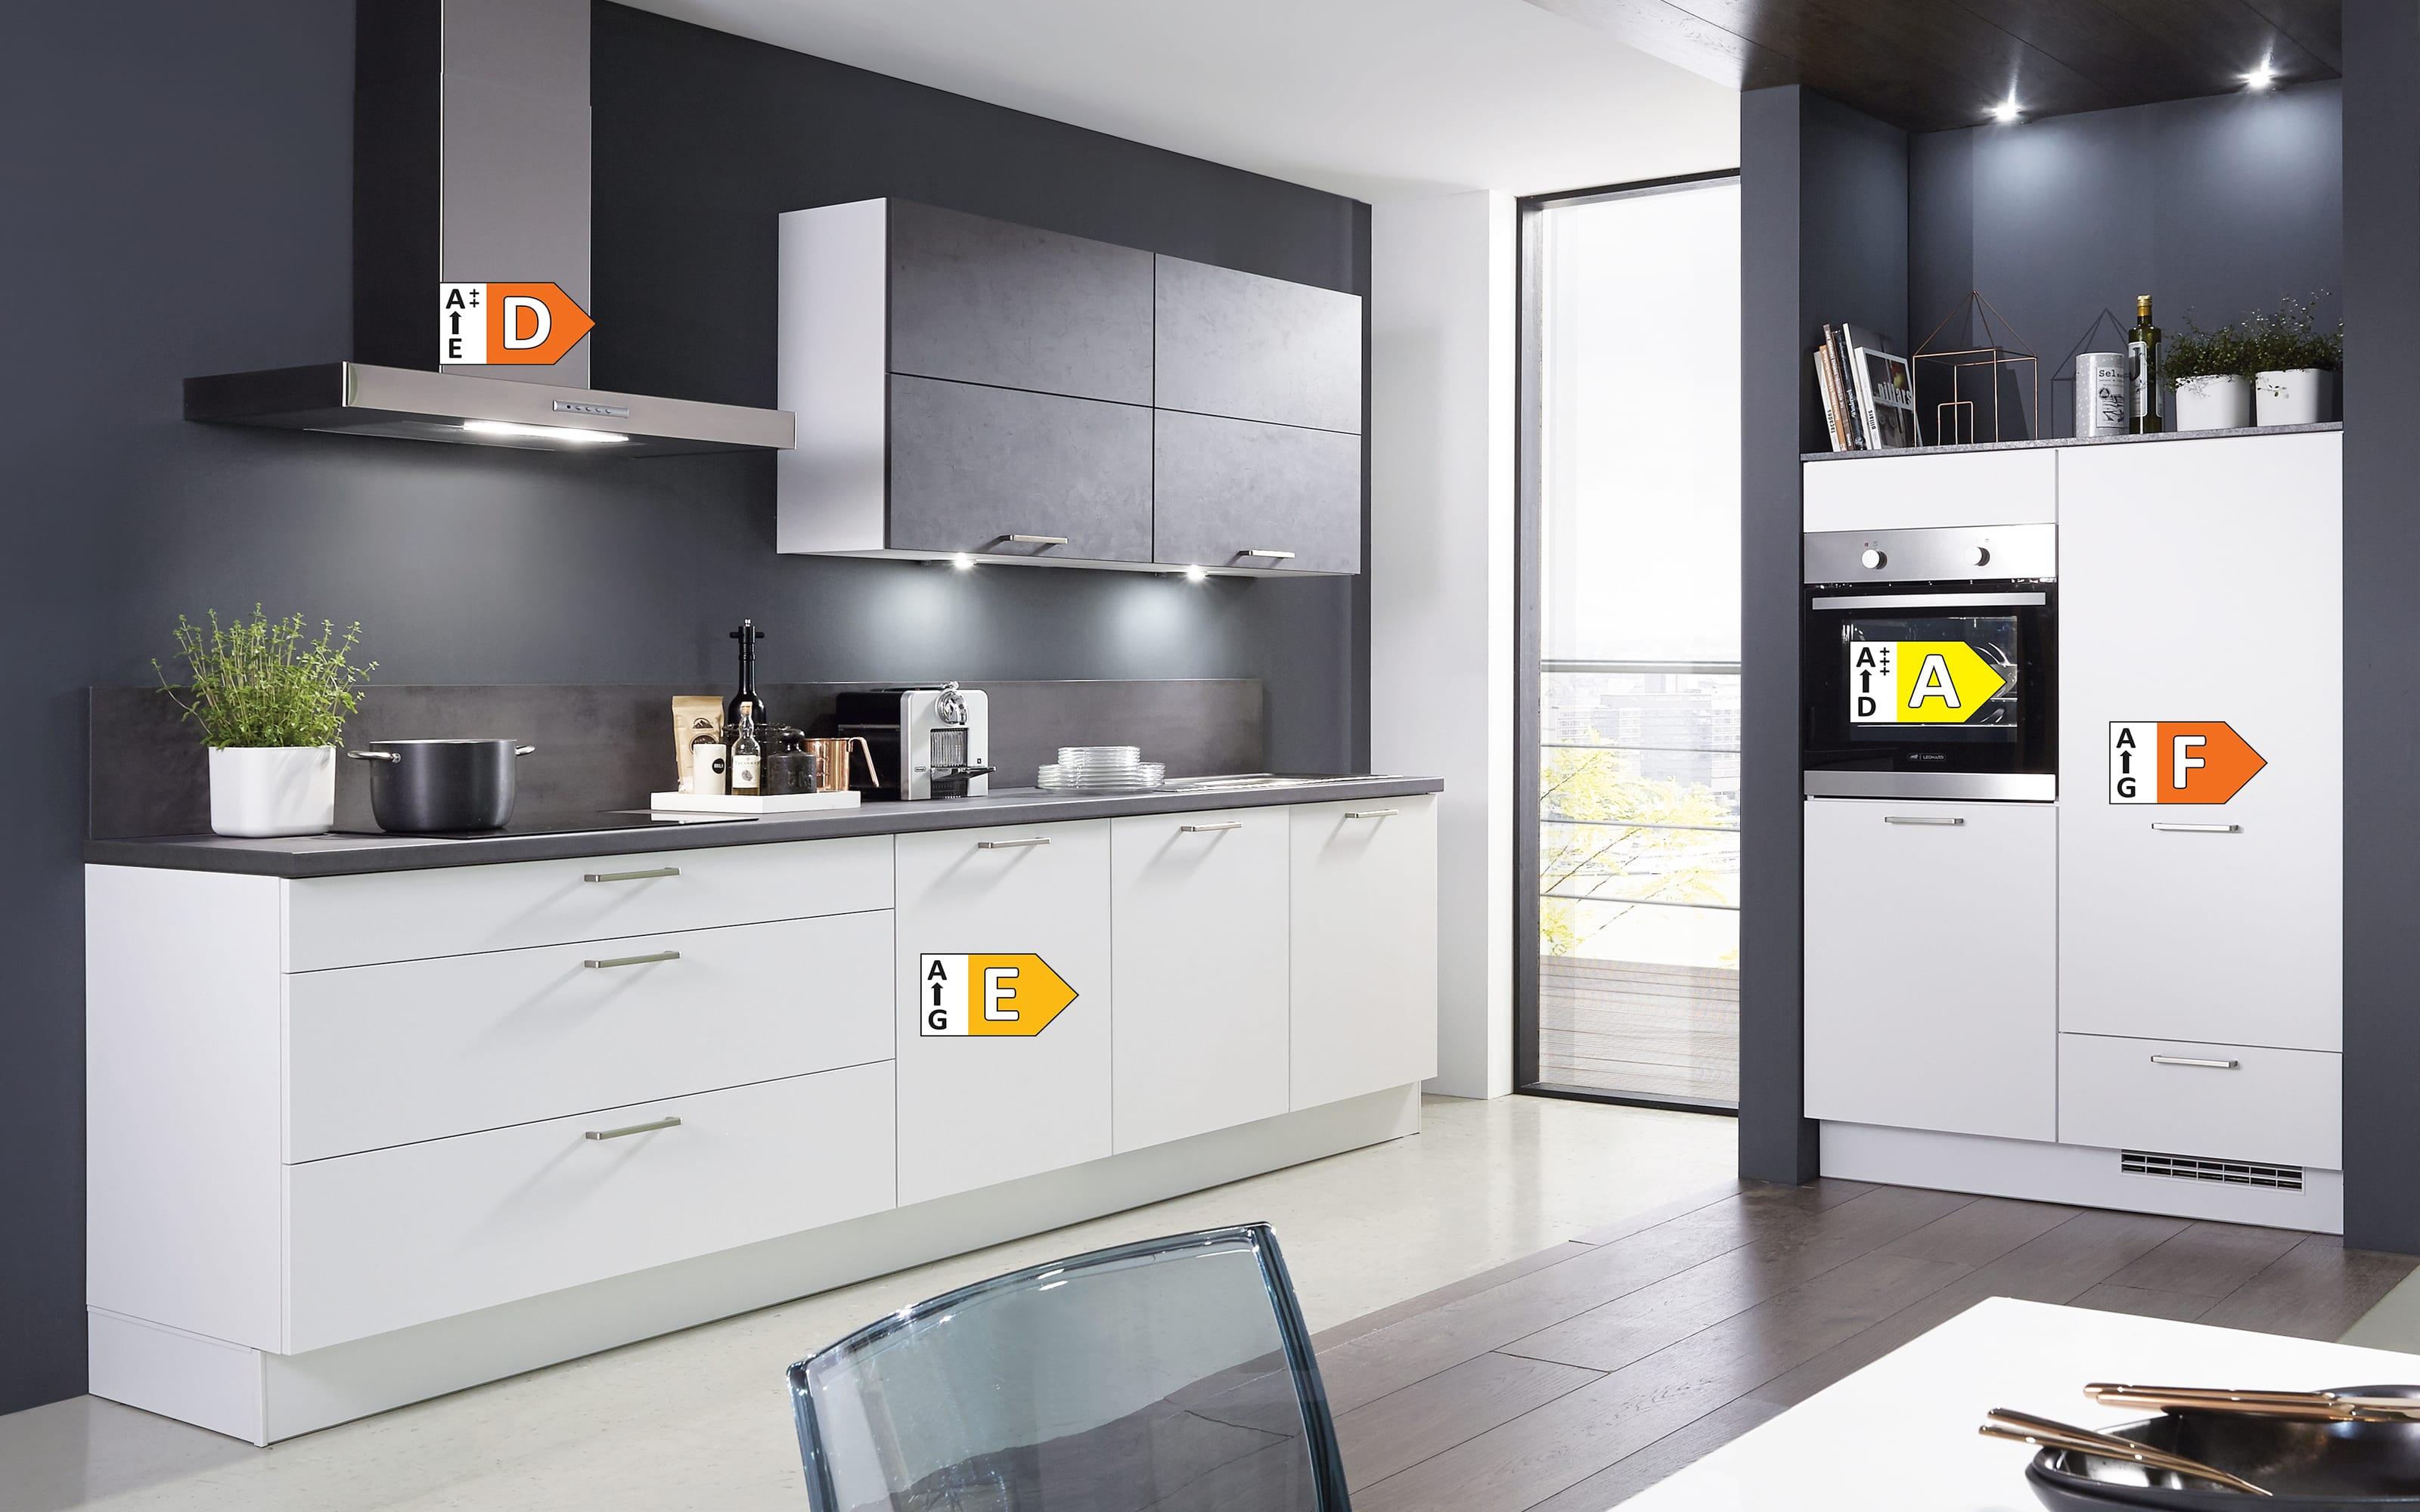 Einbauküche Fashion 168, alpinweiß matt Lack, inklusive Elektrogeräte